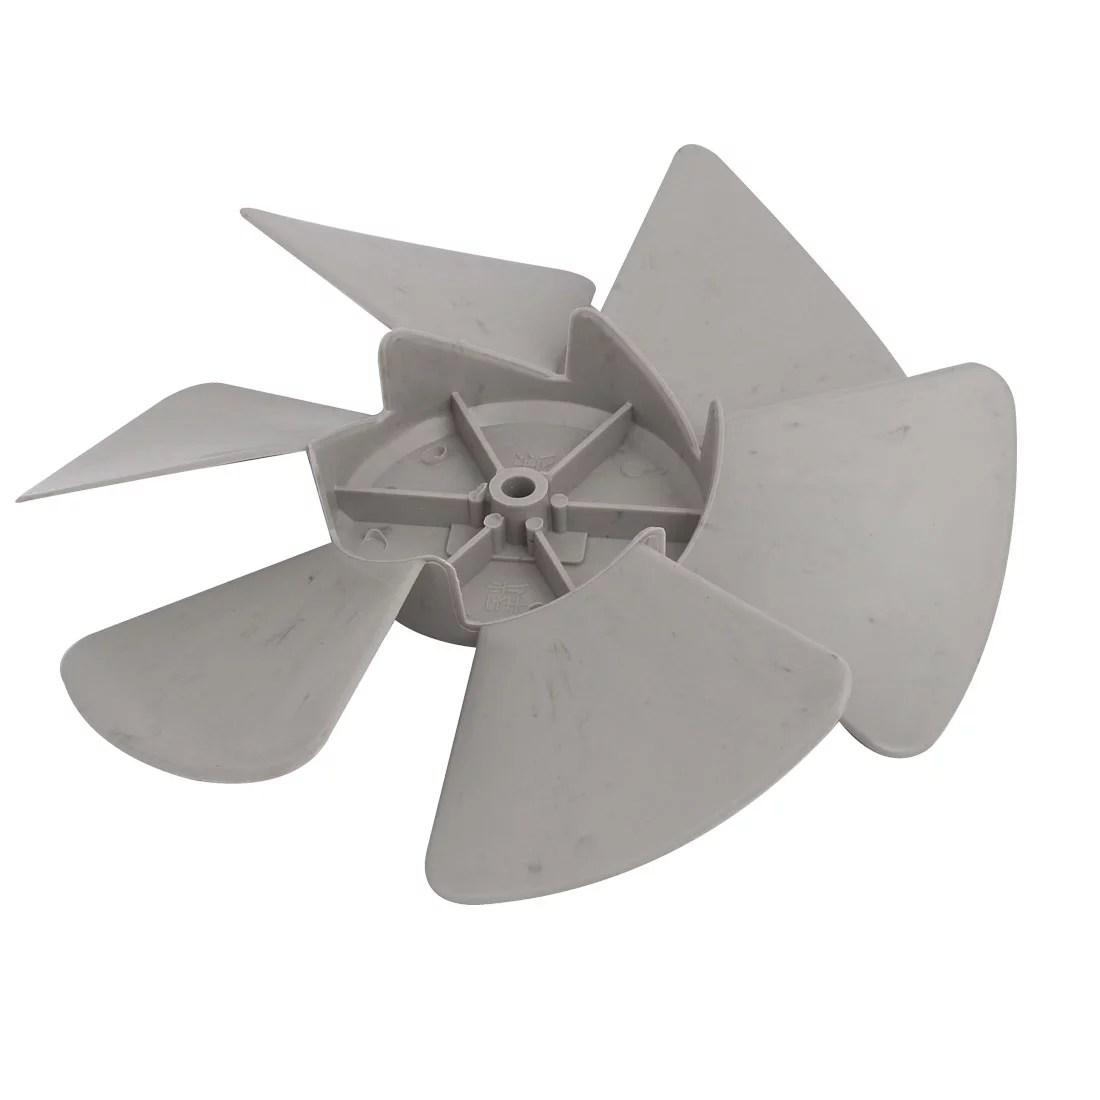 kitchen fan black cabinets unique bargains 230mm dia 8mm shaft diameter plastic home ventilator vane gray